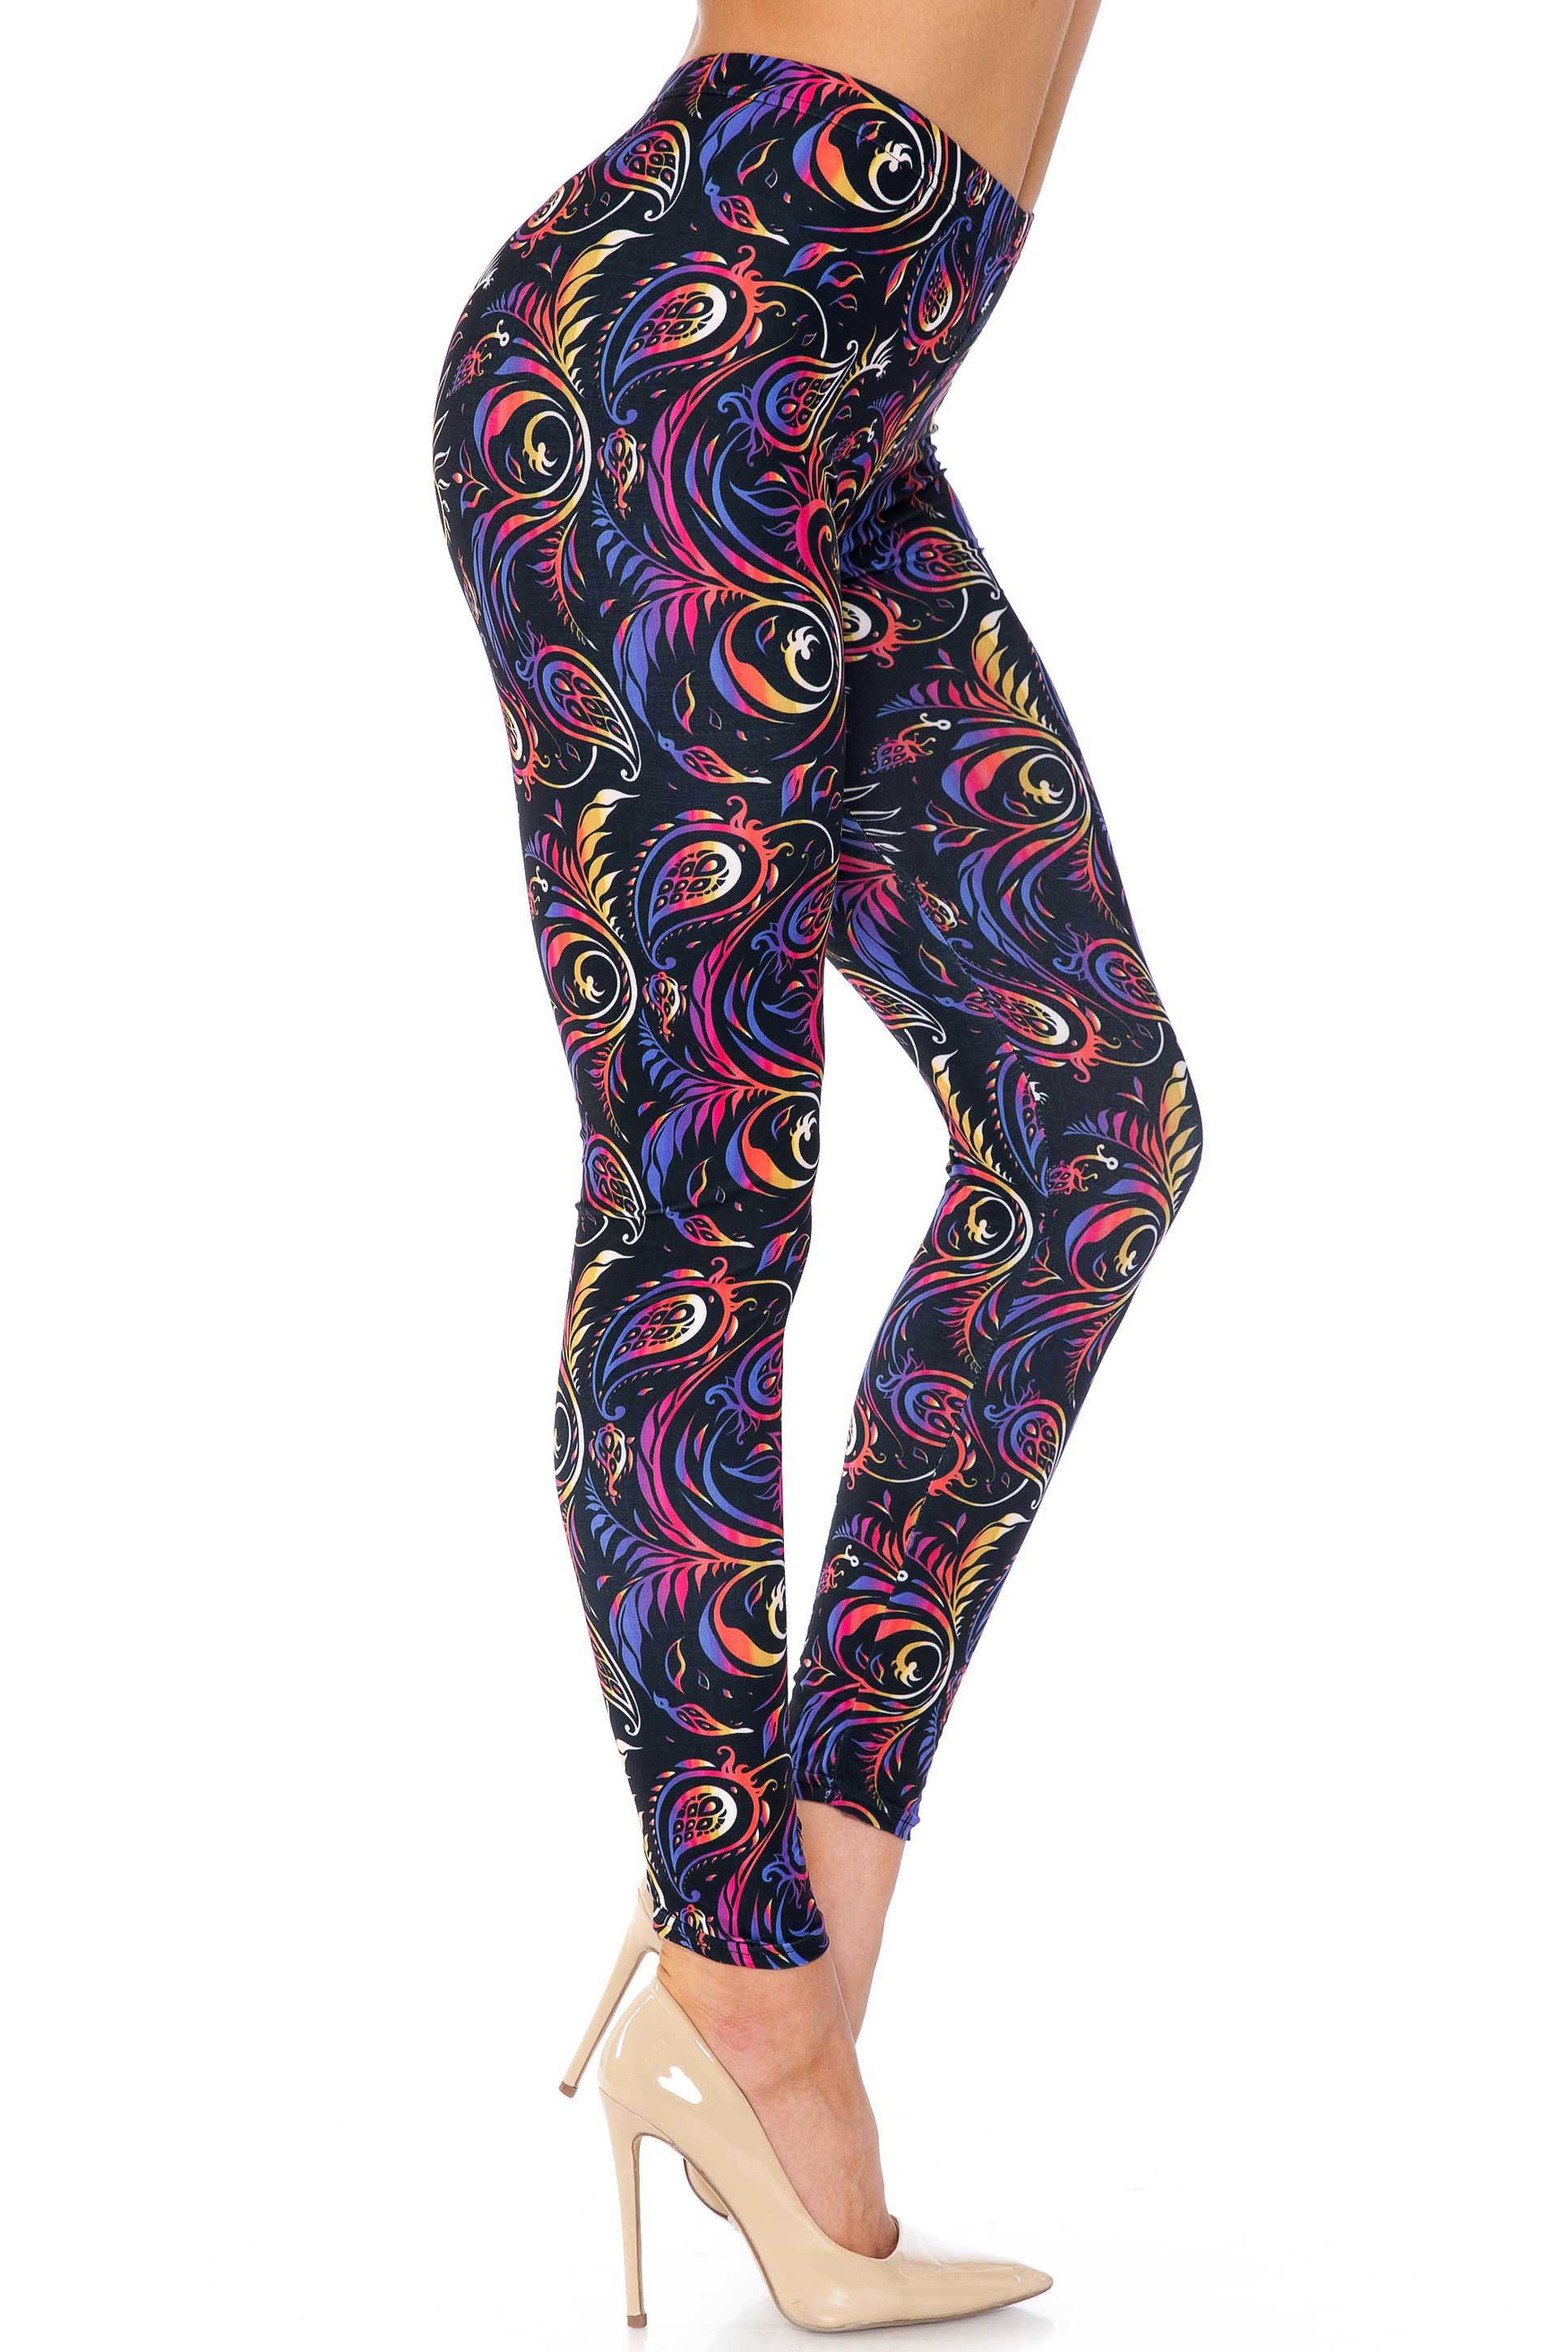 Creamy Soft Ombre Paisley Swirl Plus Size Leggings - USA Fashion™